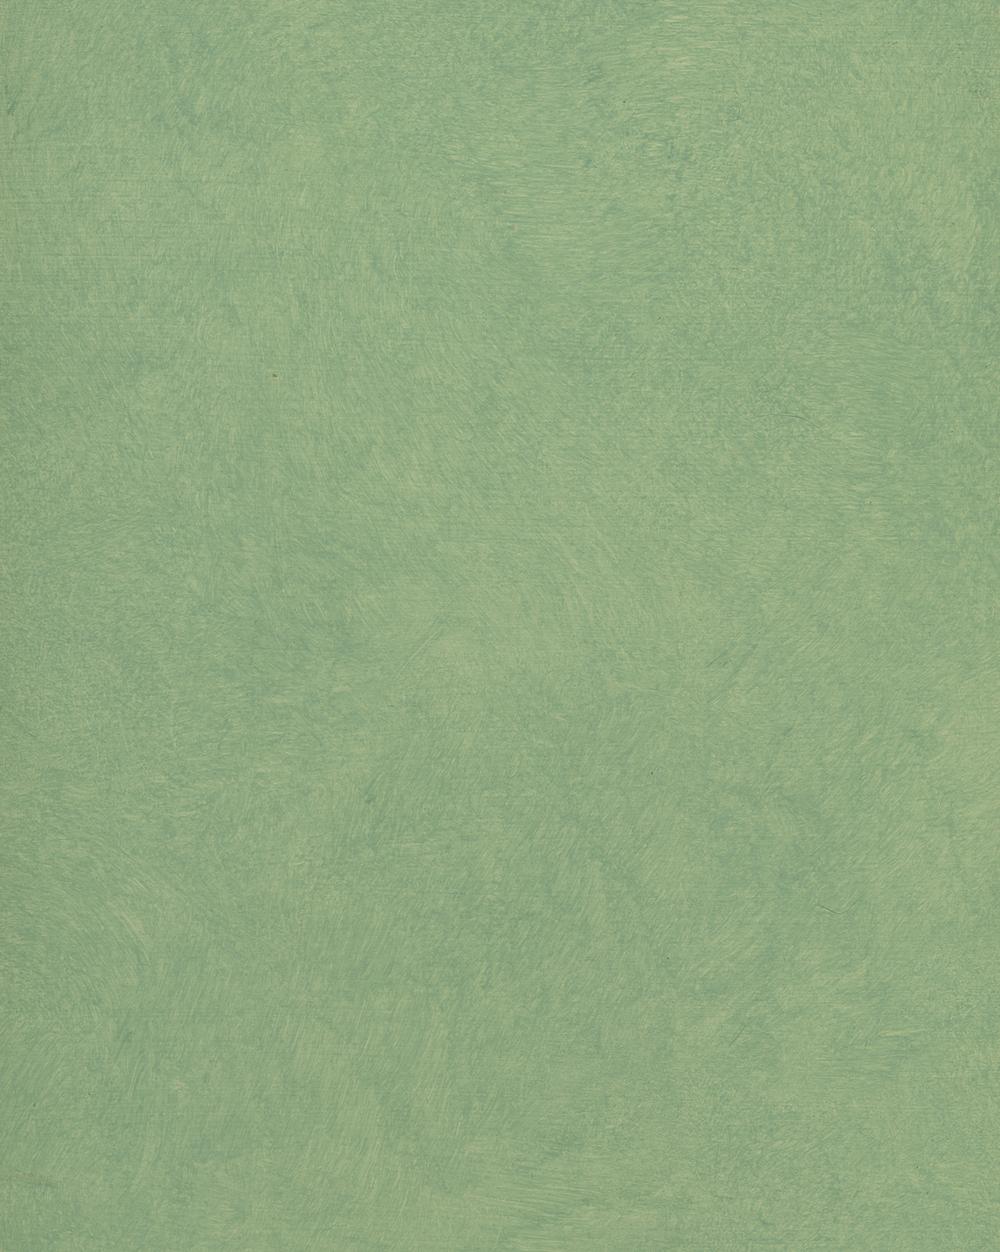 Turquoise Ragging